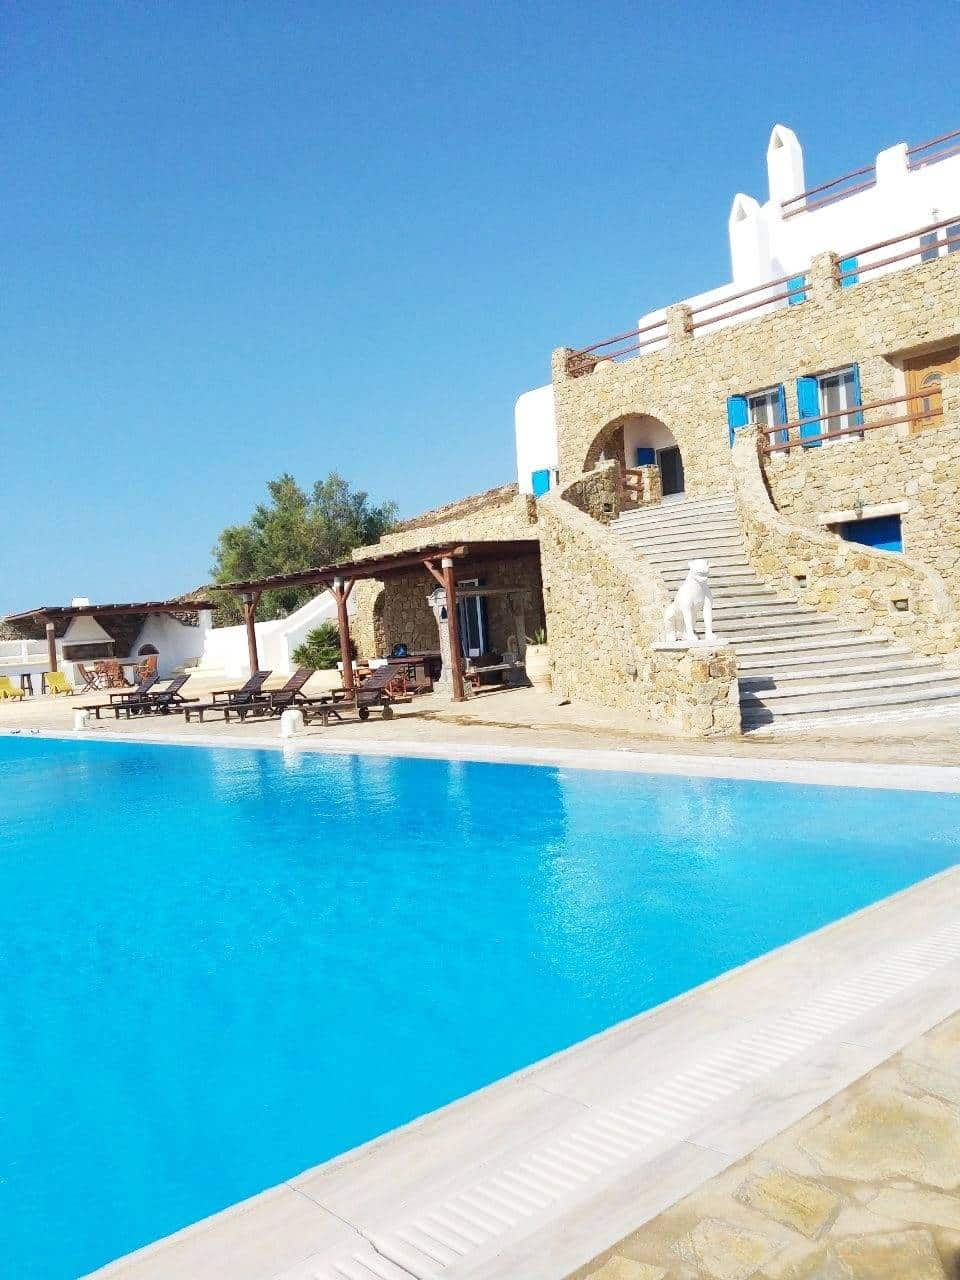 luxurious villa Mykonos - πολυτελής βίλα Μύκονος - mykonos services - οικοδομικές εργασίες 16